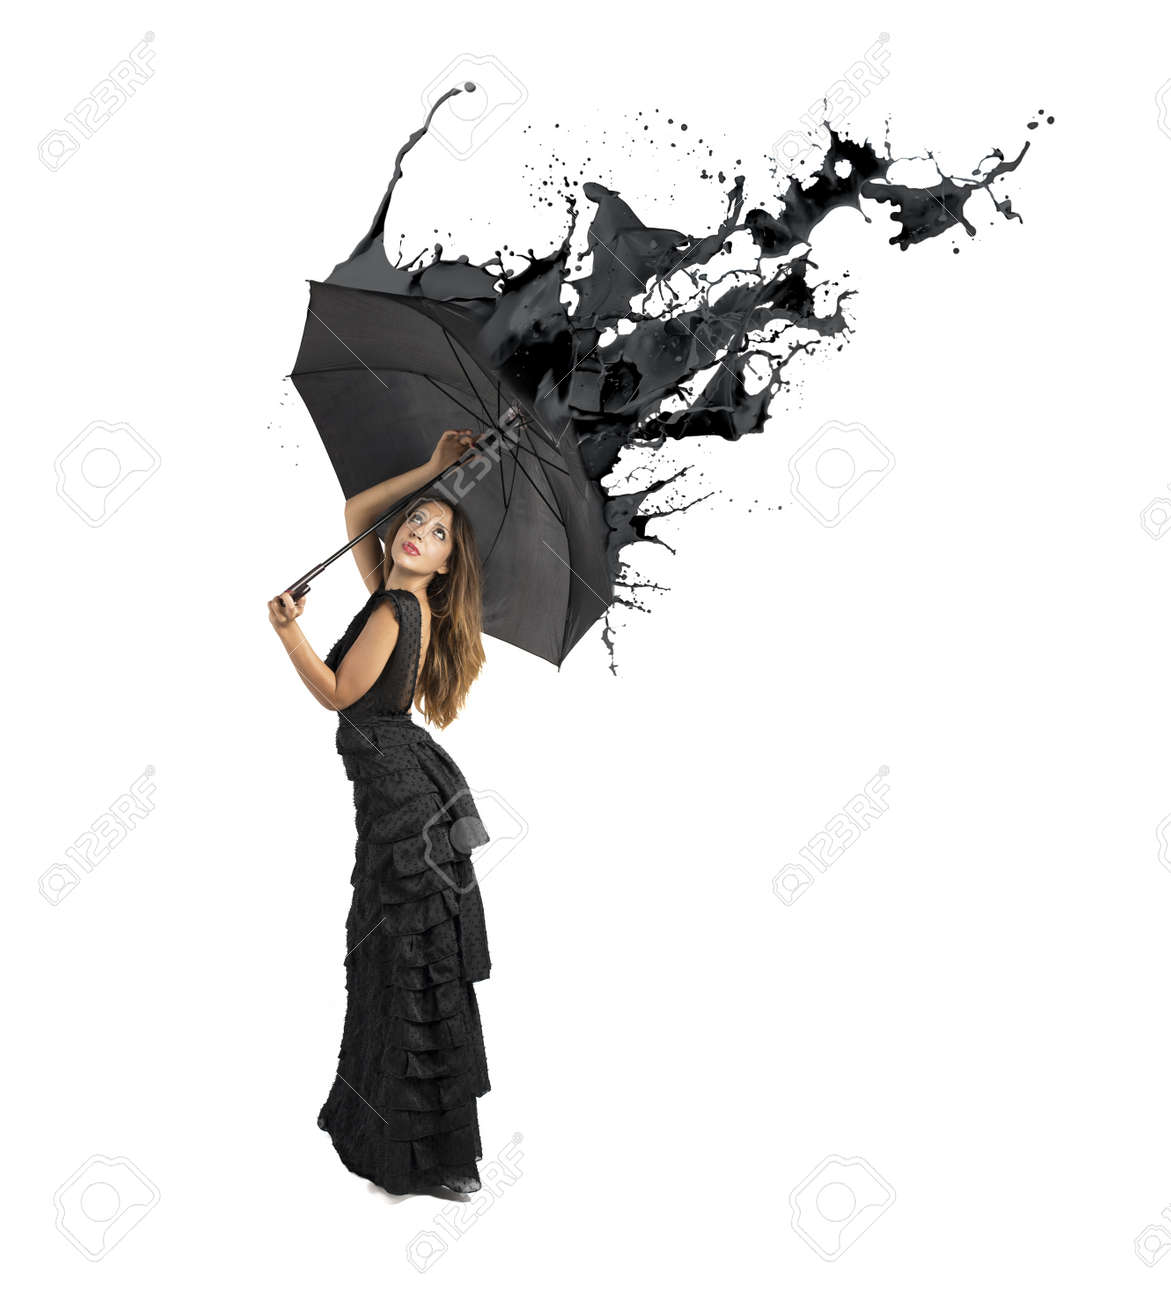 Concept of black color splash with girl holding umbrella Stock Photo - 22070345